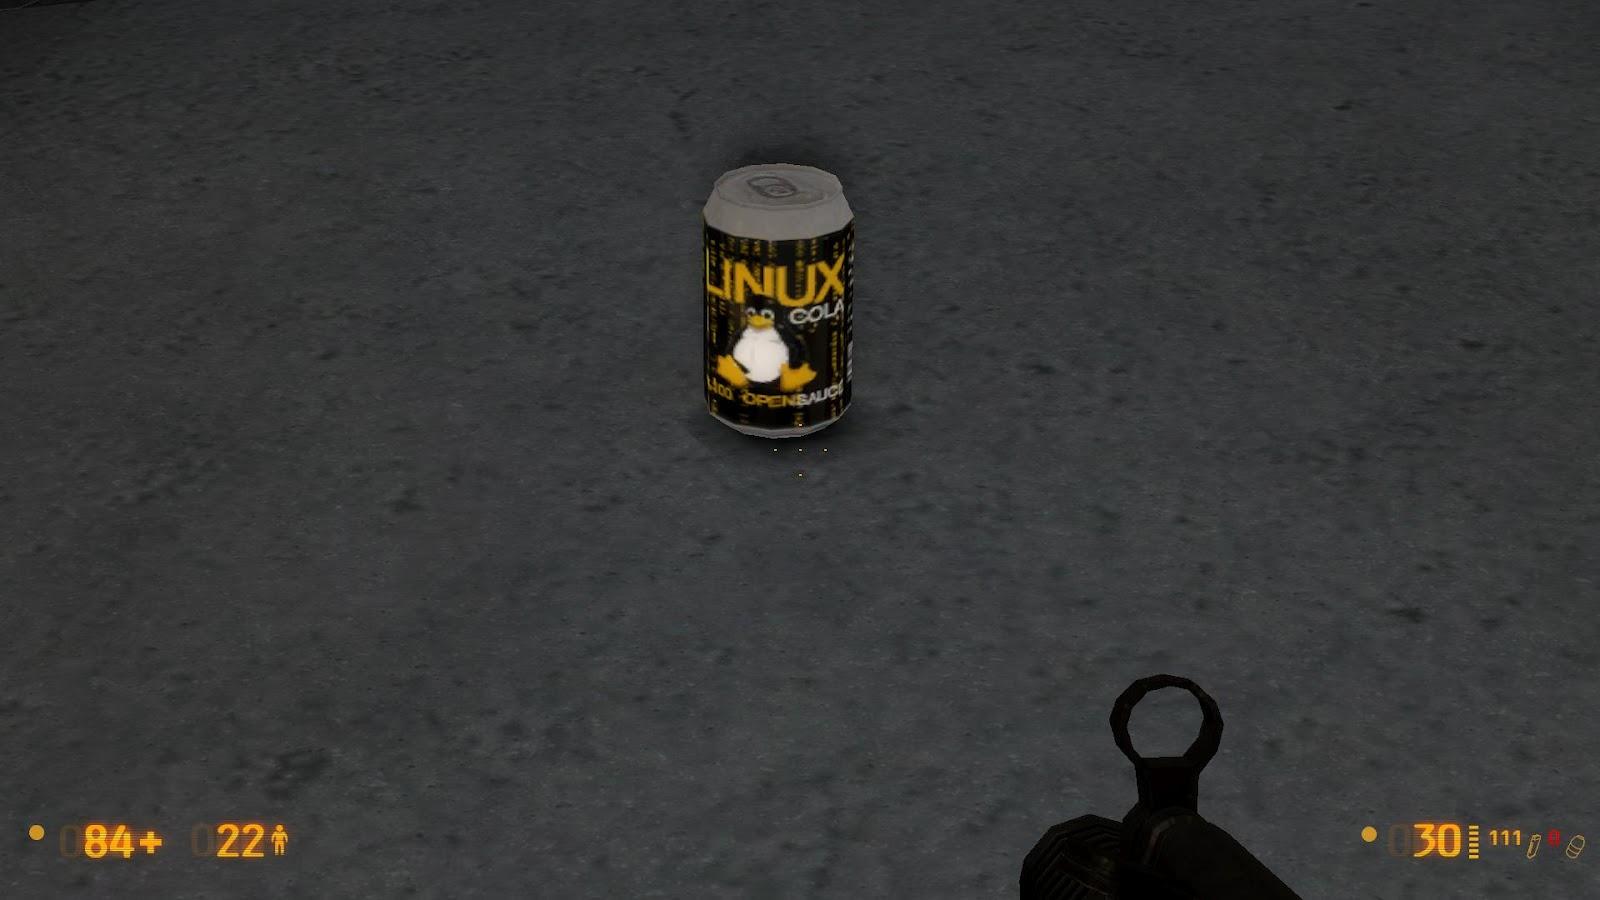 Linux Cola, 100% Open Sauce